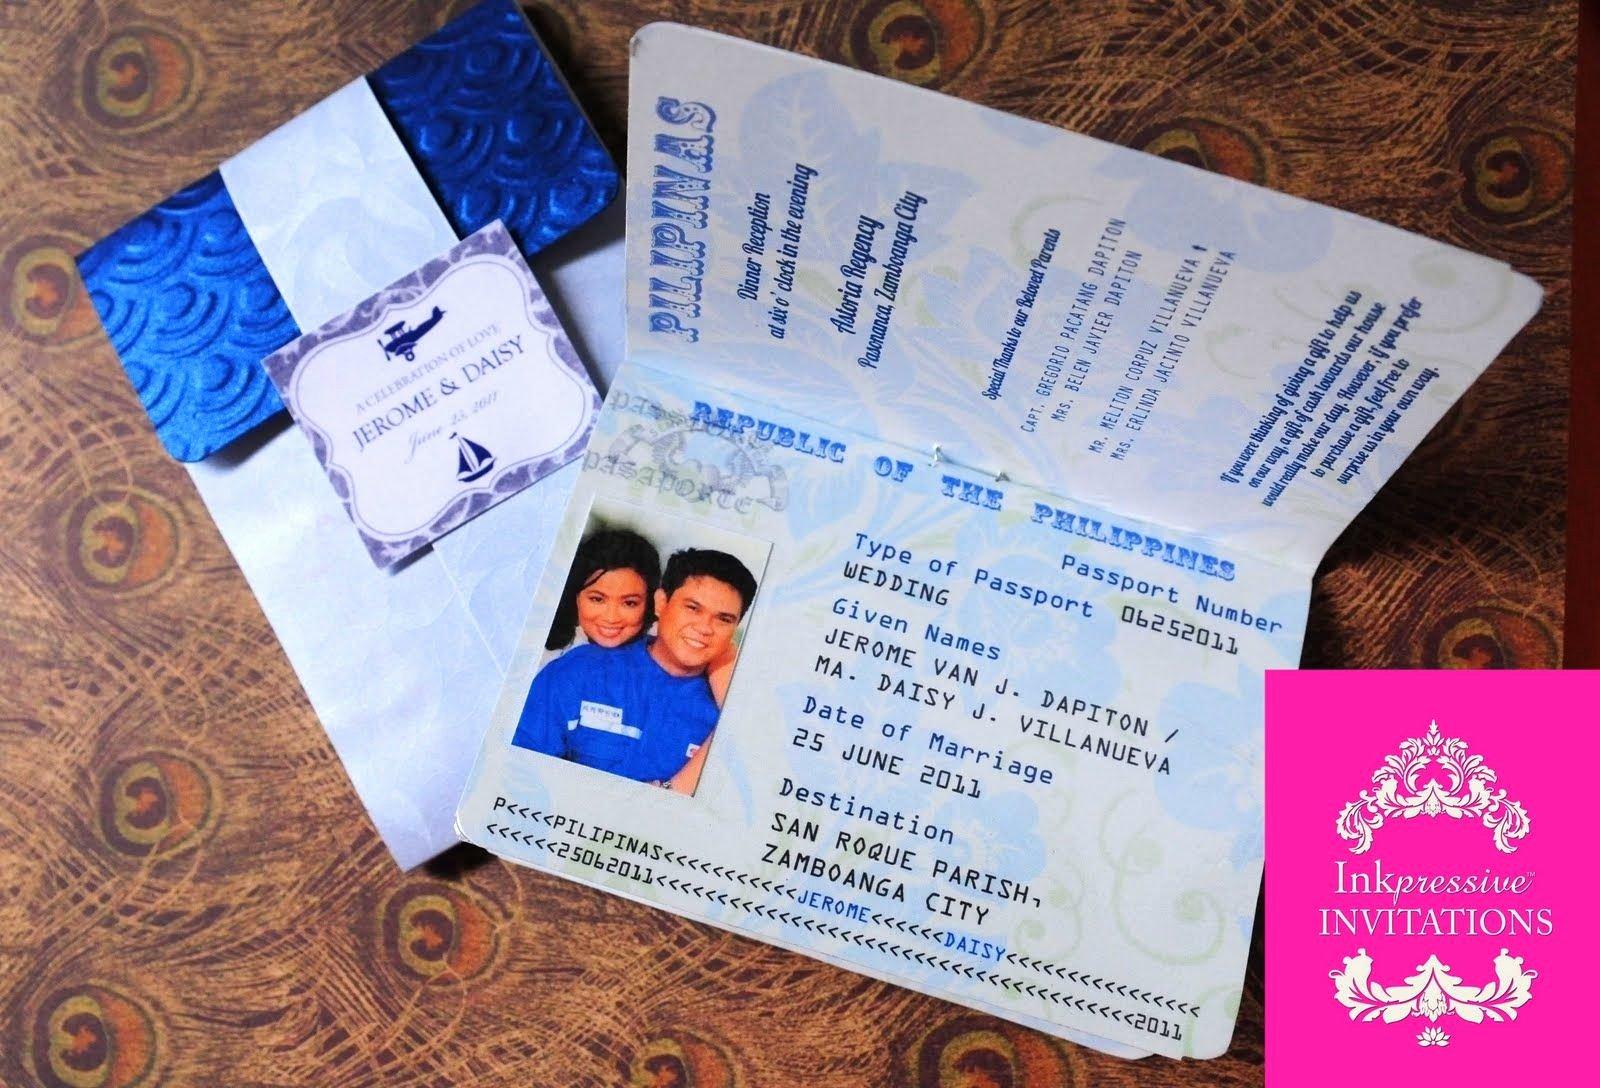 Passport Invitation Template Free New Passport Wedding Invitations Template